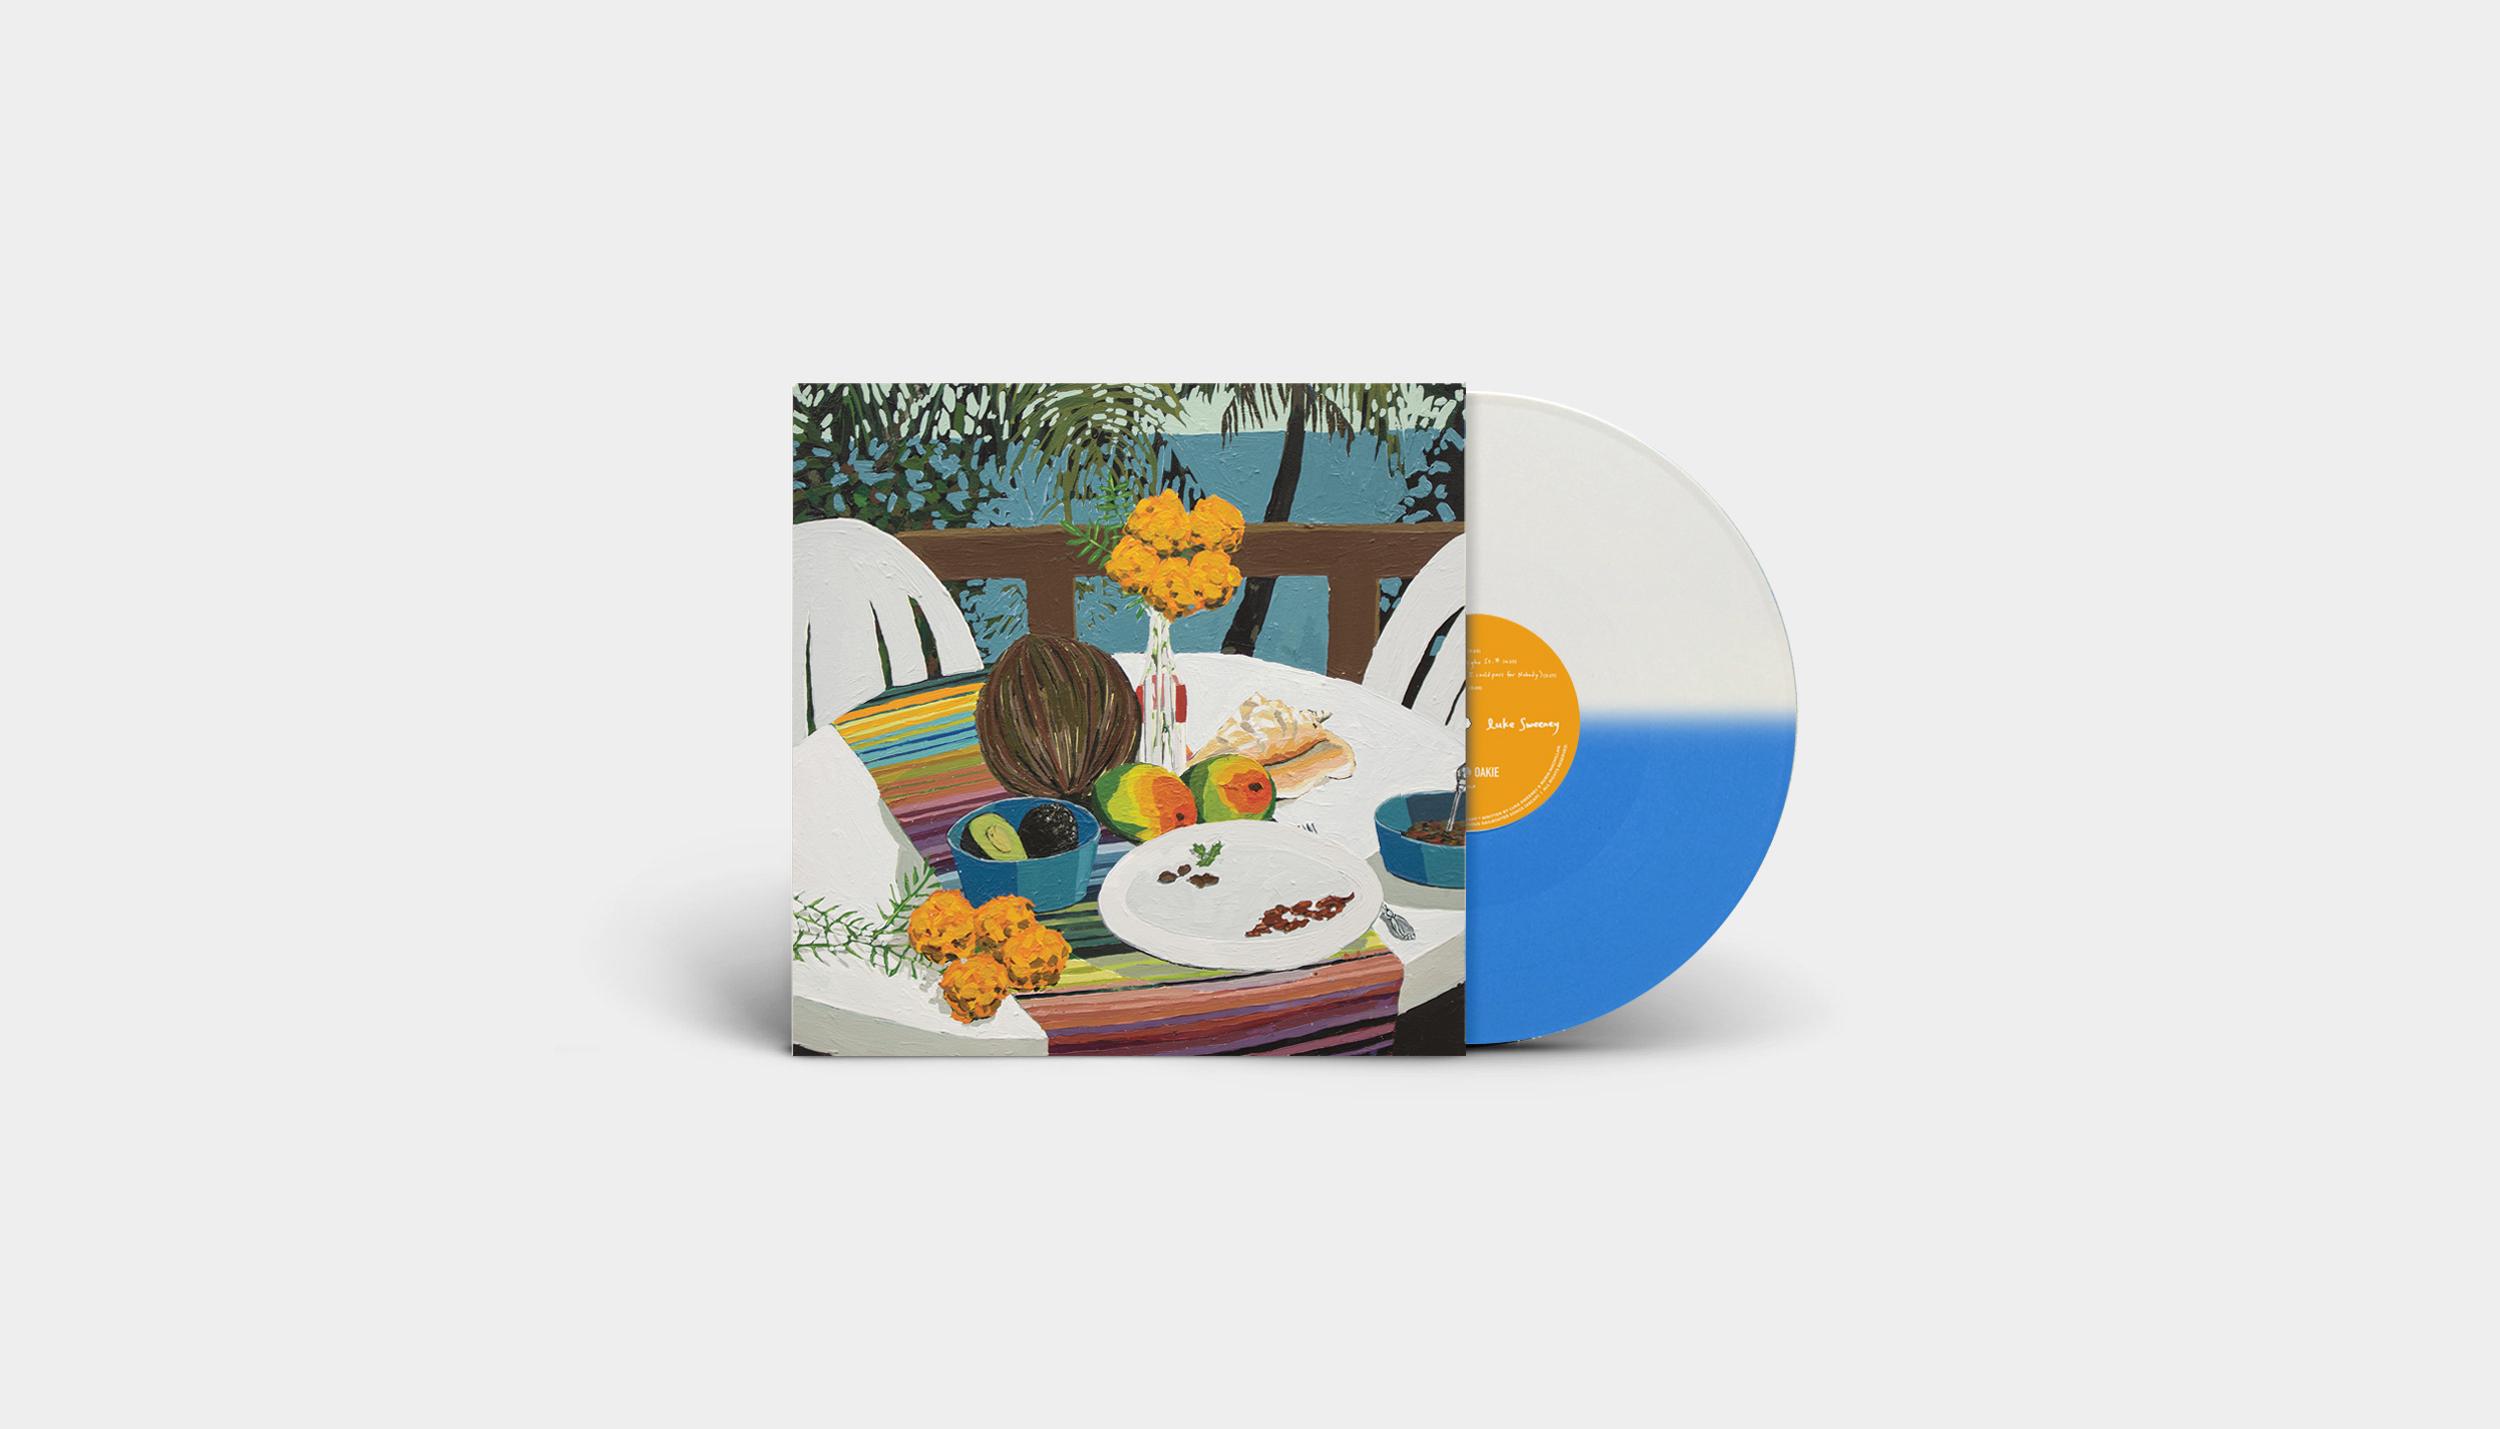 DE019LP-peacemeal-album-mockup-wide-BlueWhiteSplit-Vinyl.jpg